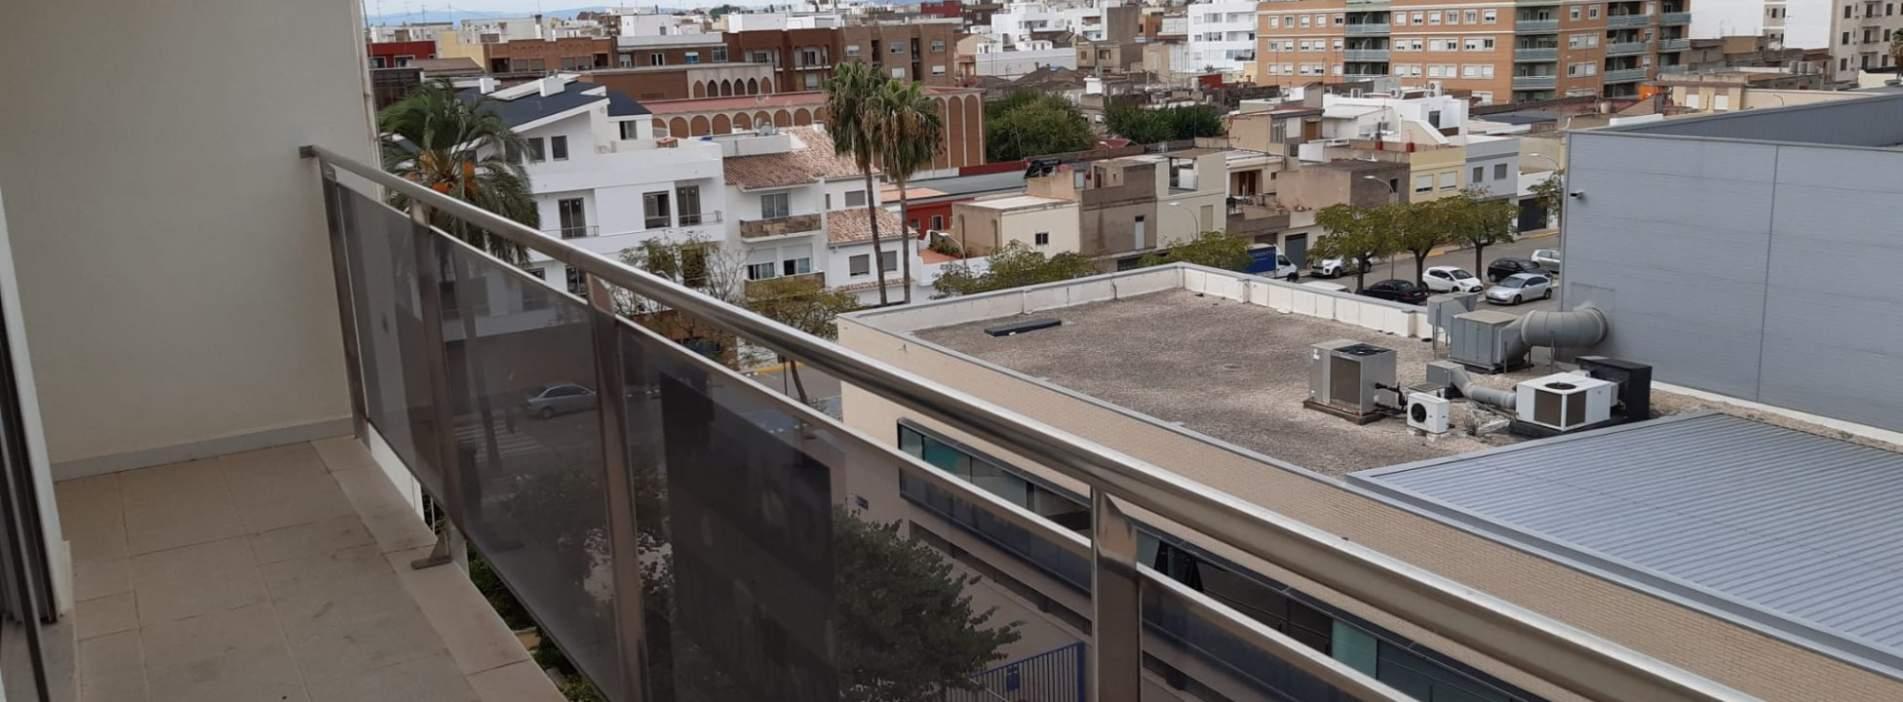 Piso en venta  en Calle Ausias March, Almussafes, Valencia